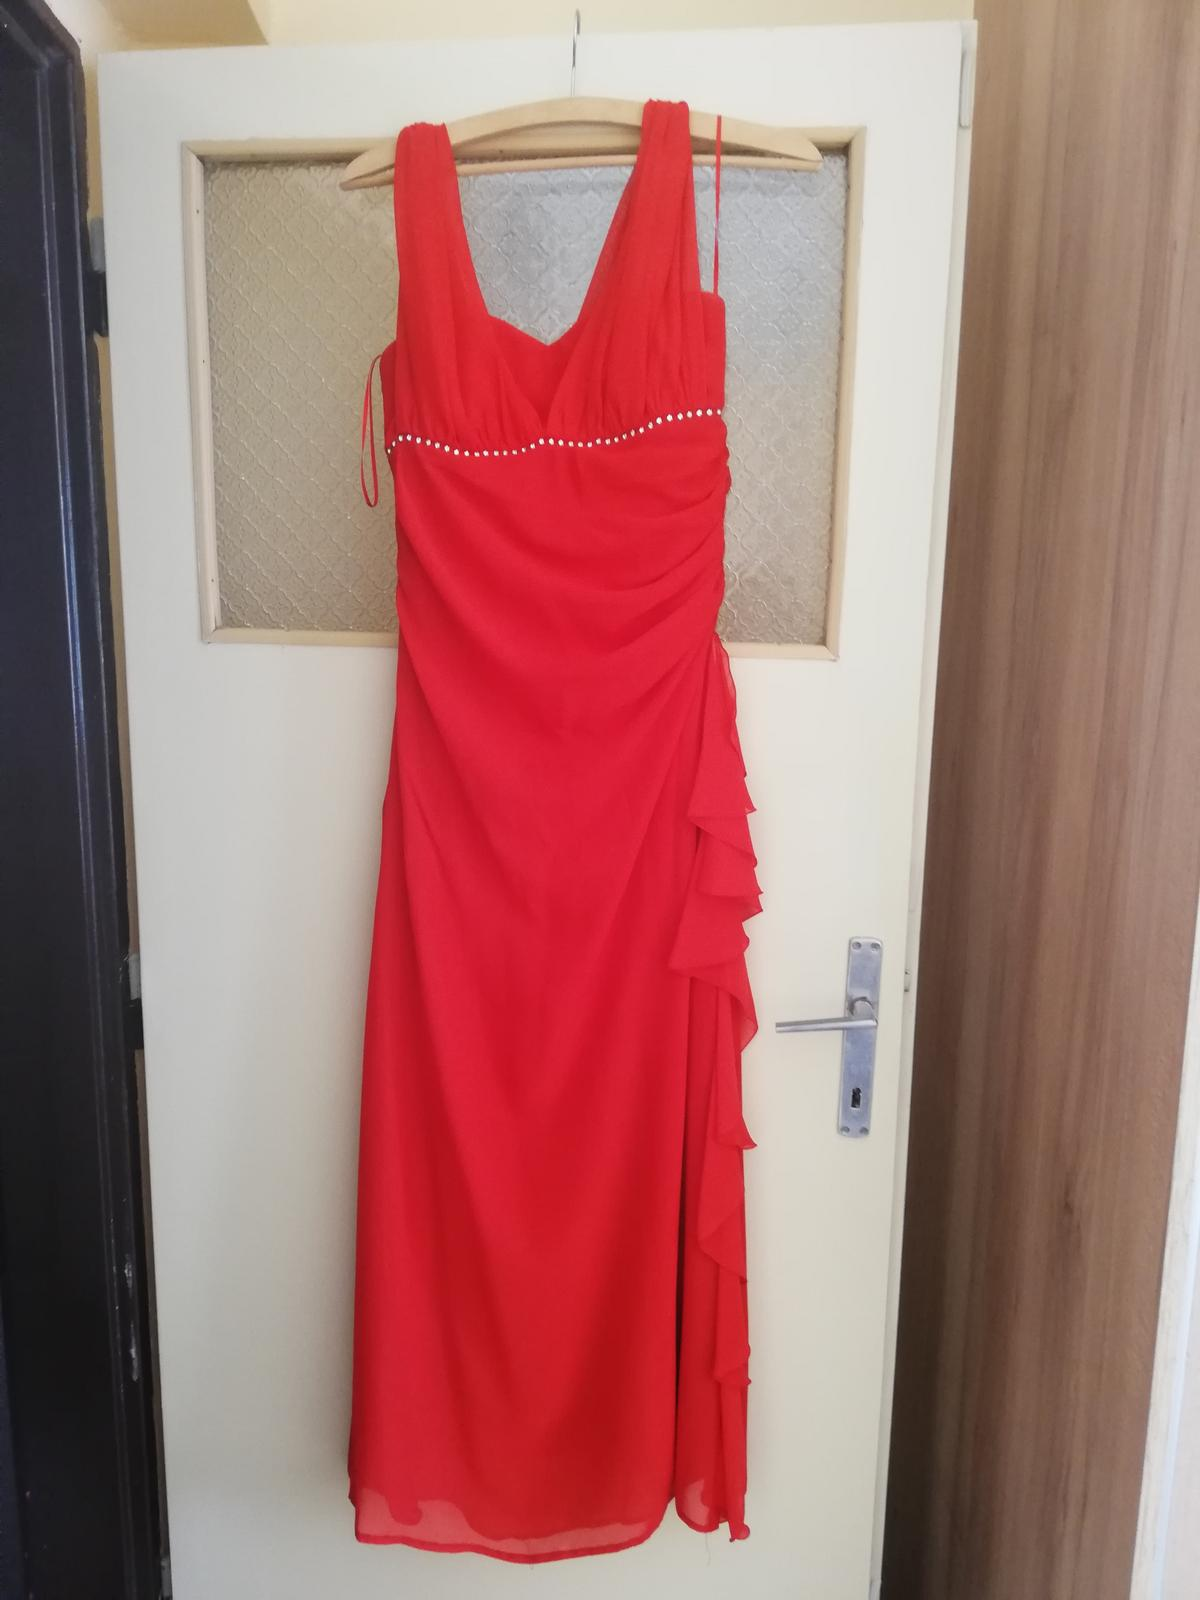 Červené šaty dlhé  - Obrázok č. 1